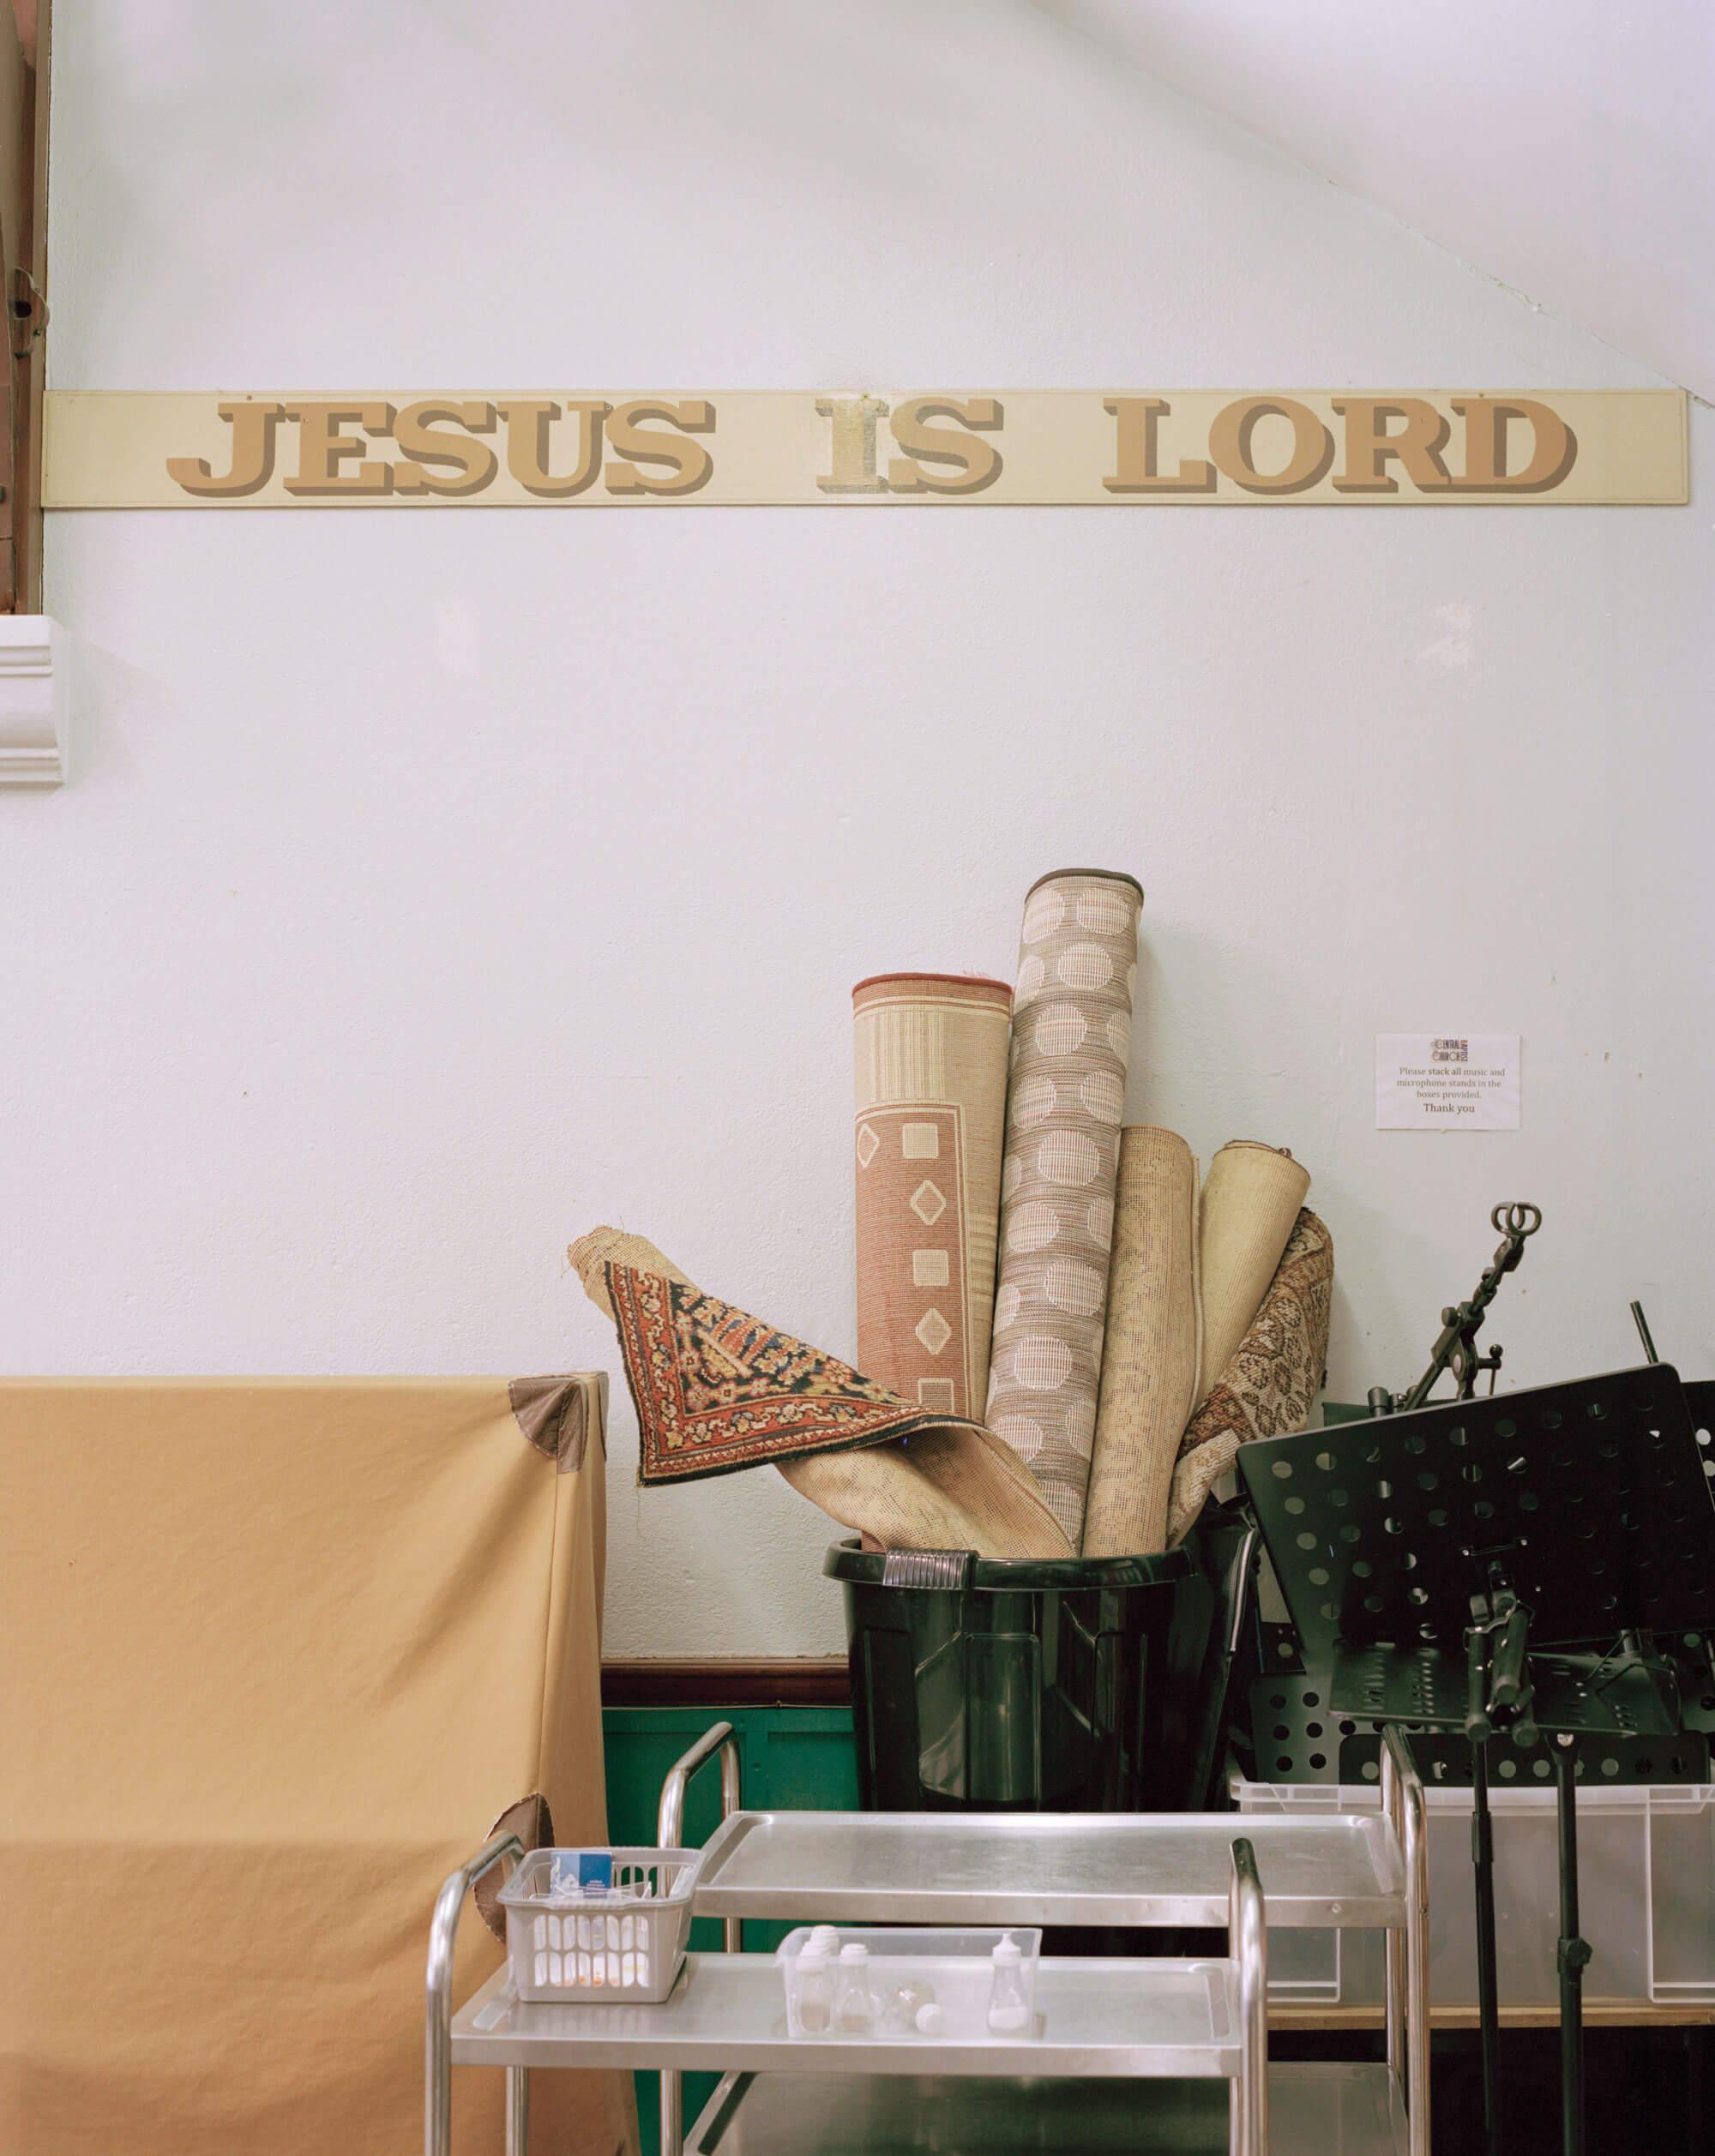 Jesus is lord wall paper in the Catholic Church by matt Scott